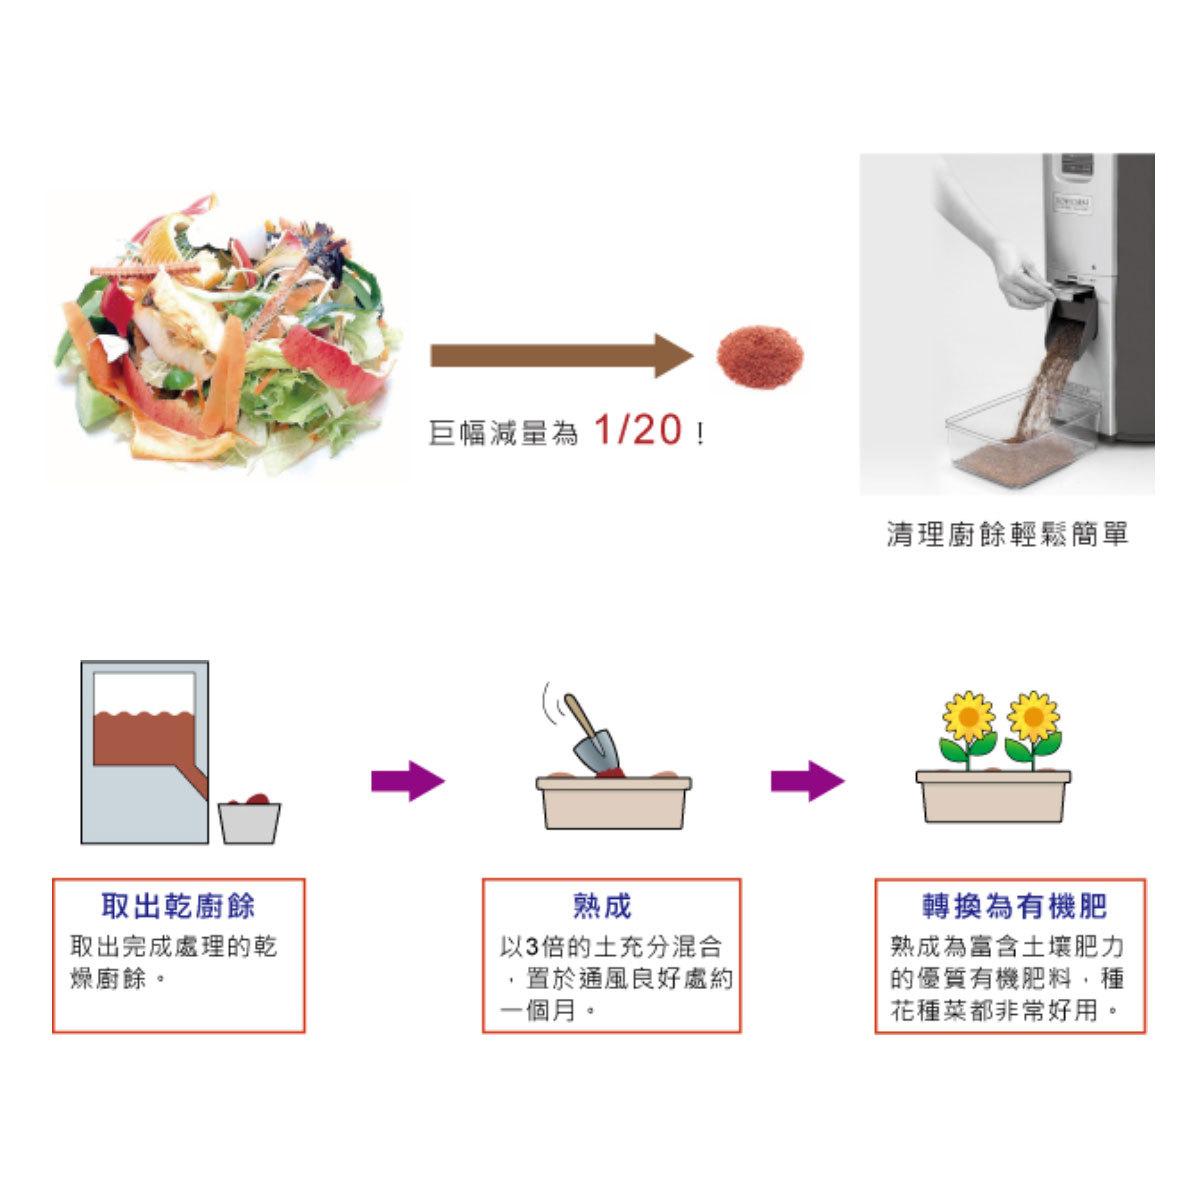 Chikuma CSD201TW 廚下型家用廚餘機 非排氣型乾燥式